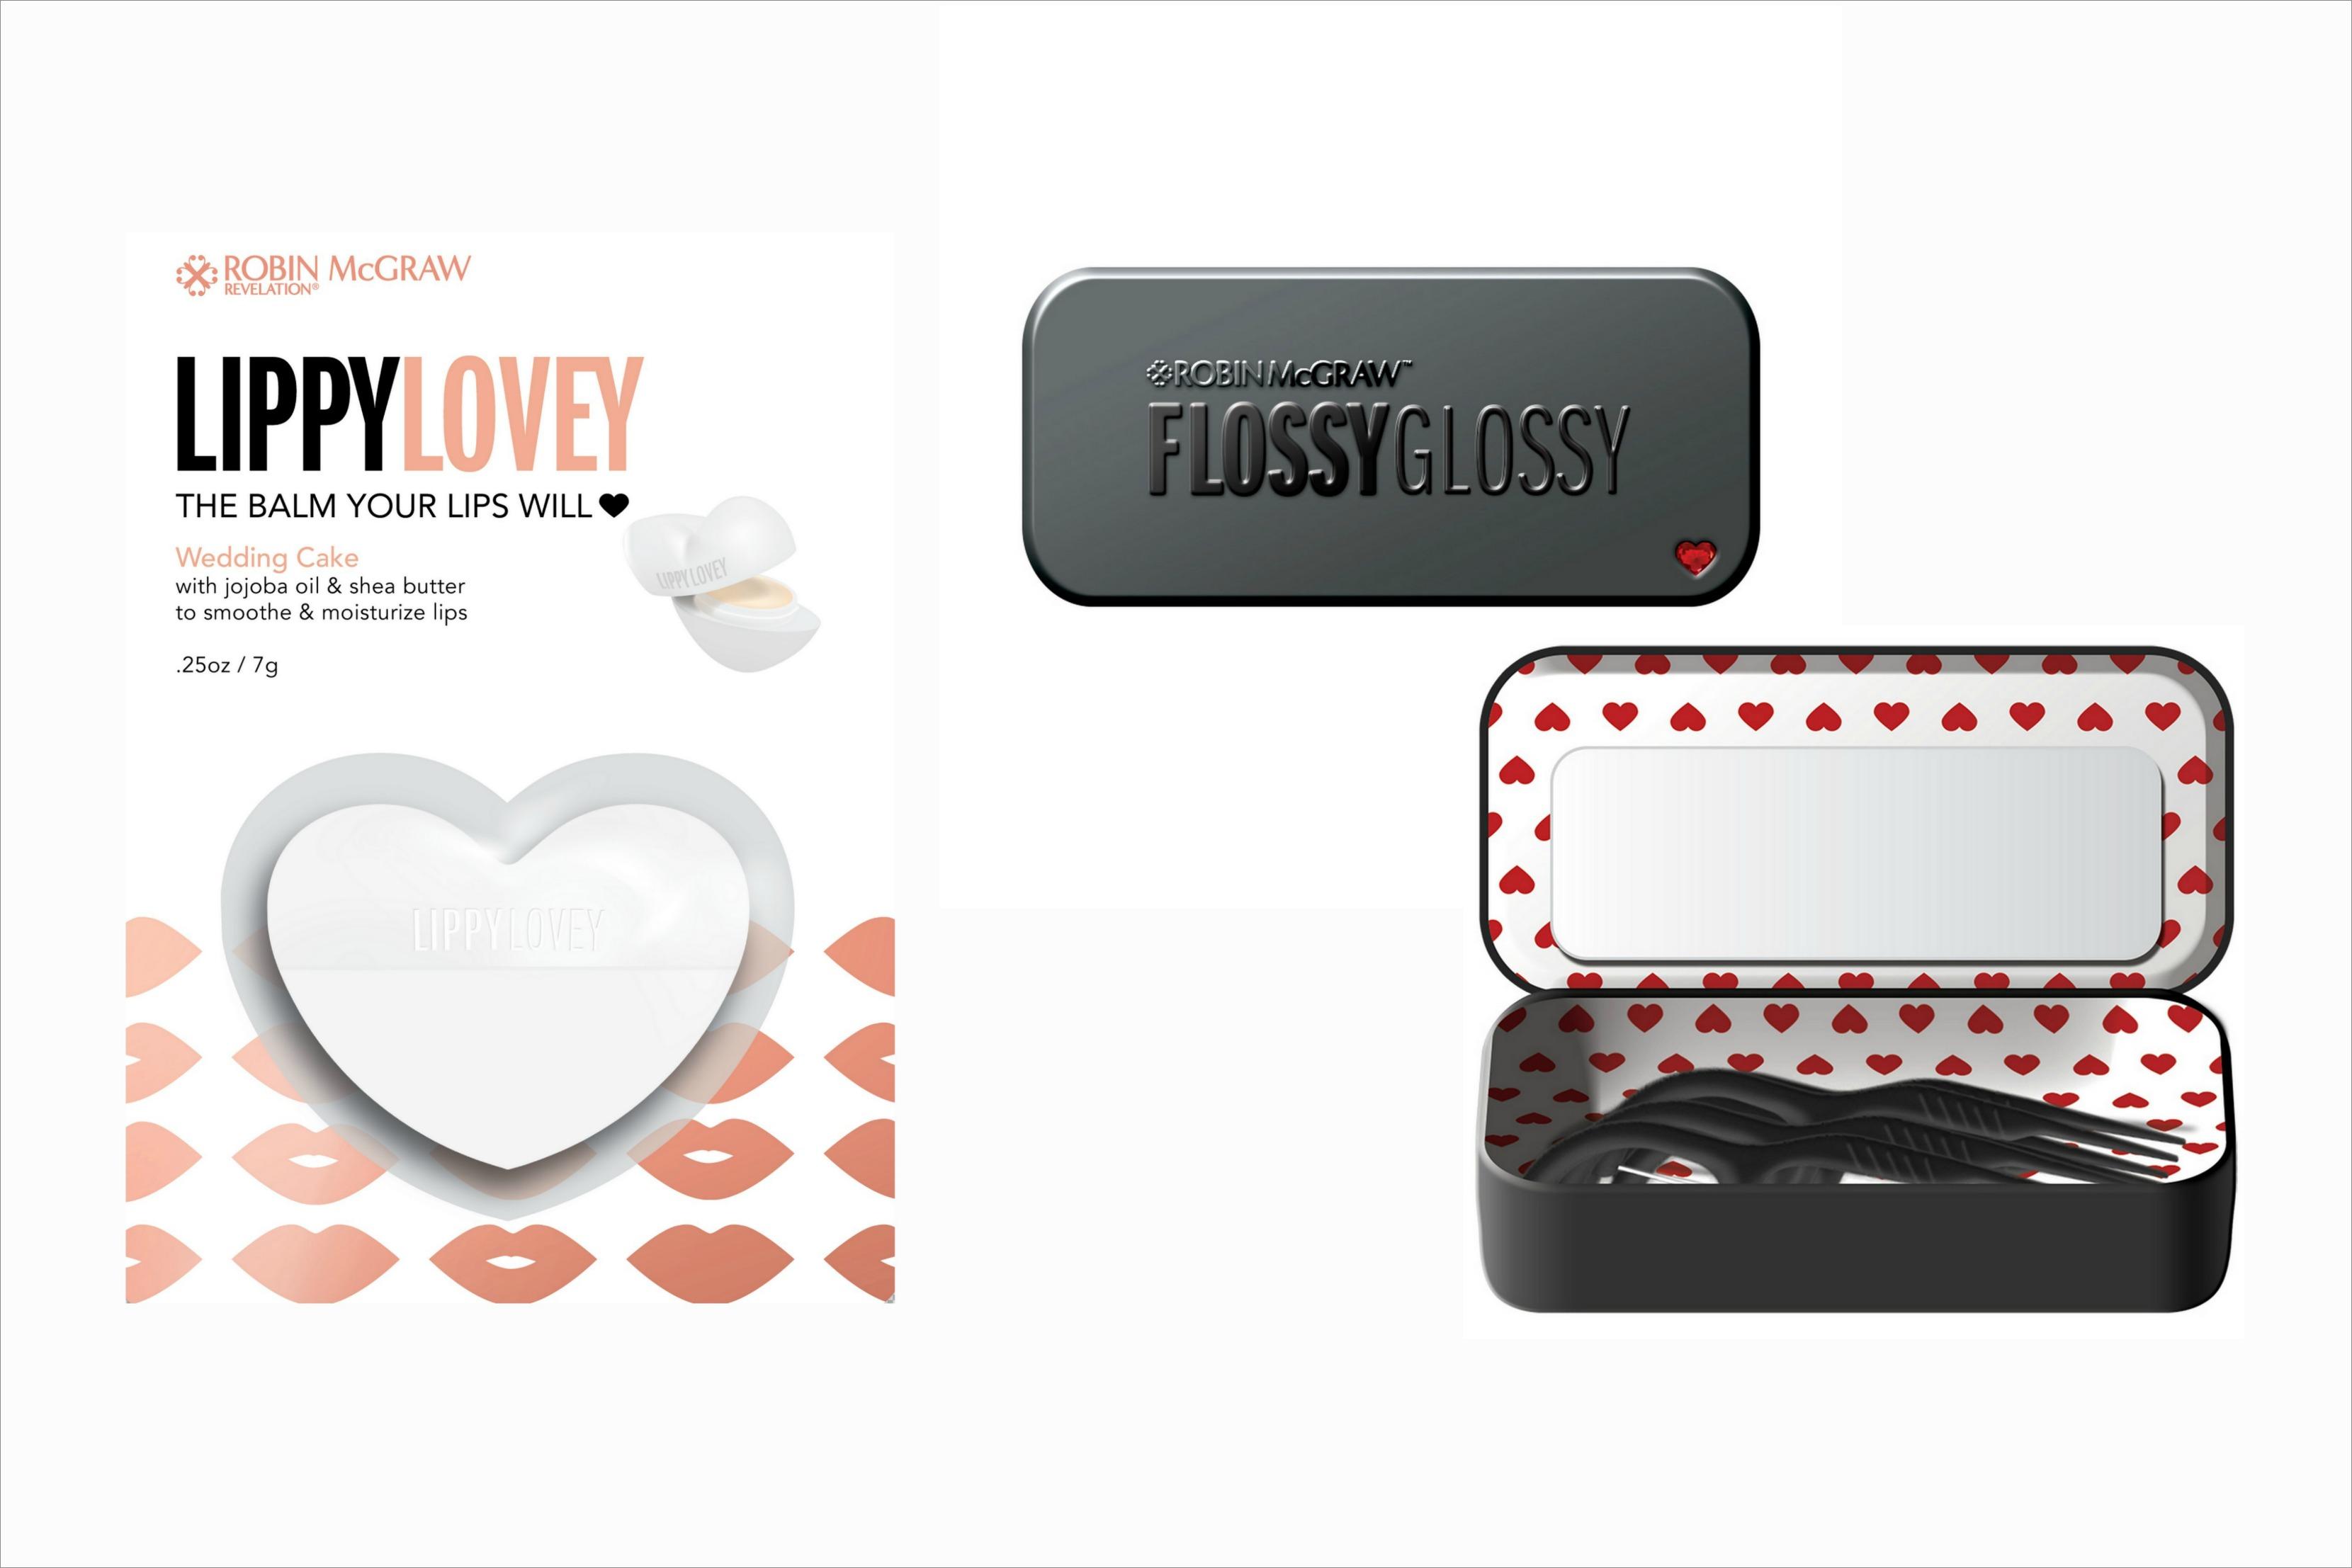 Robin McGraw Revelation Flossy Glossy and Lippy Lovey